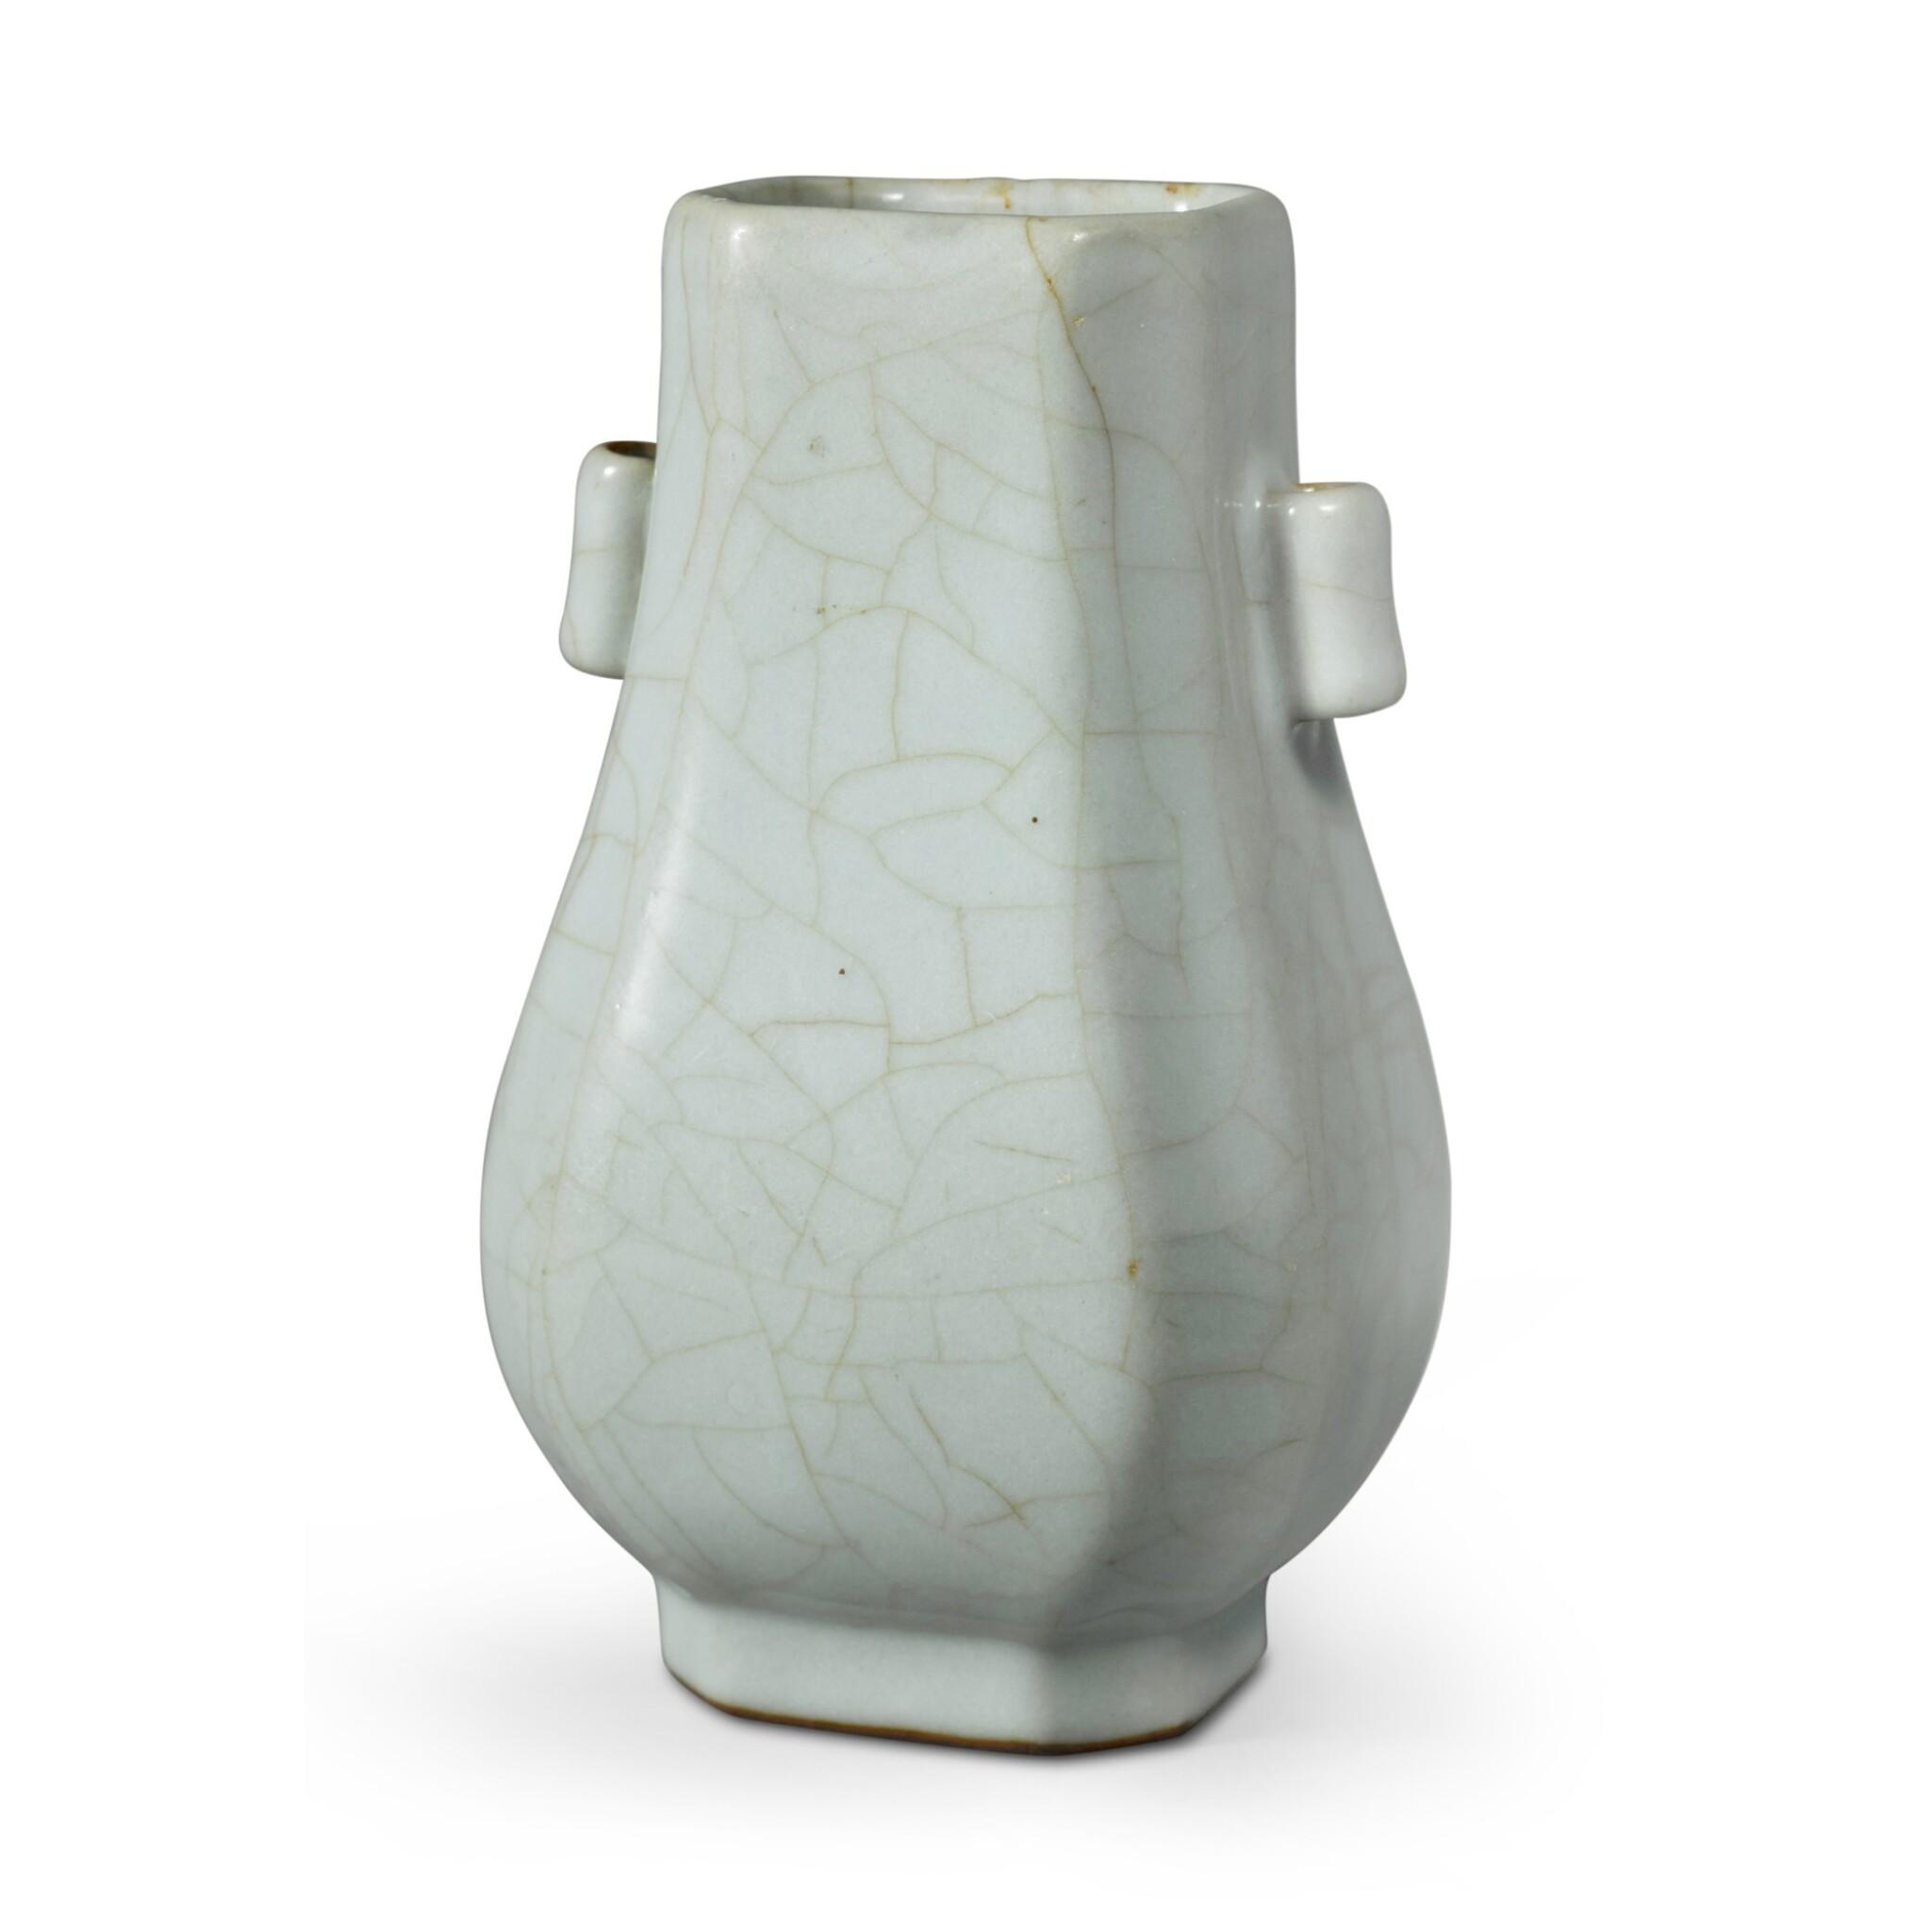 View full screen - View 1 of Lot 142. A Guan-type faceted vase, Seal mark and period of Qianlong | 清乾隆 仿官釉八方貫耳壺 《大清乾隆年製》款.